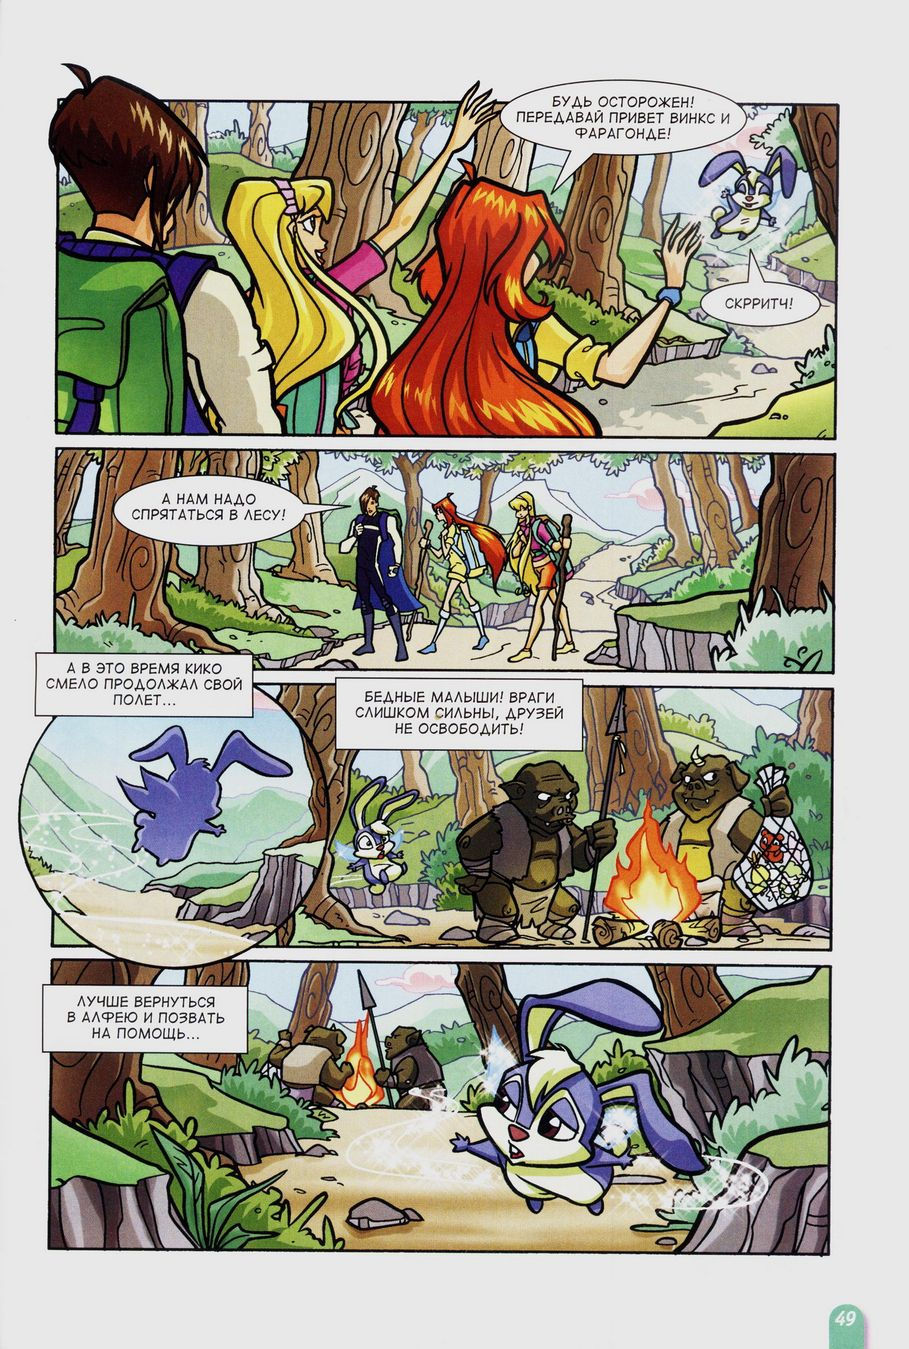 Комикс Винкс Winx - Волшебник Камуд (Журнал Винкс №6 2011) - стр. 49